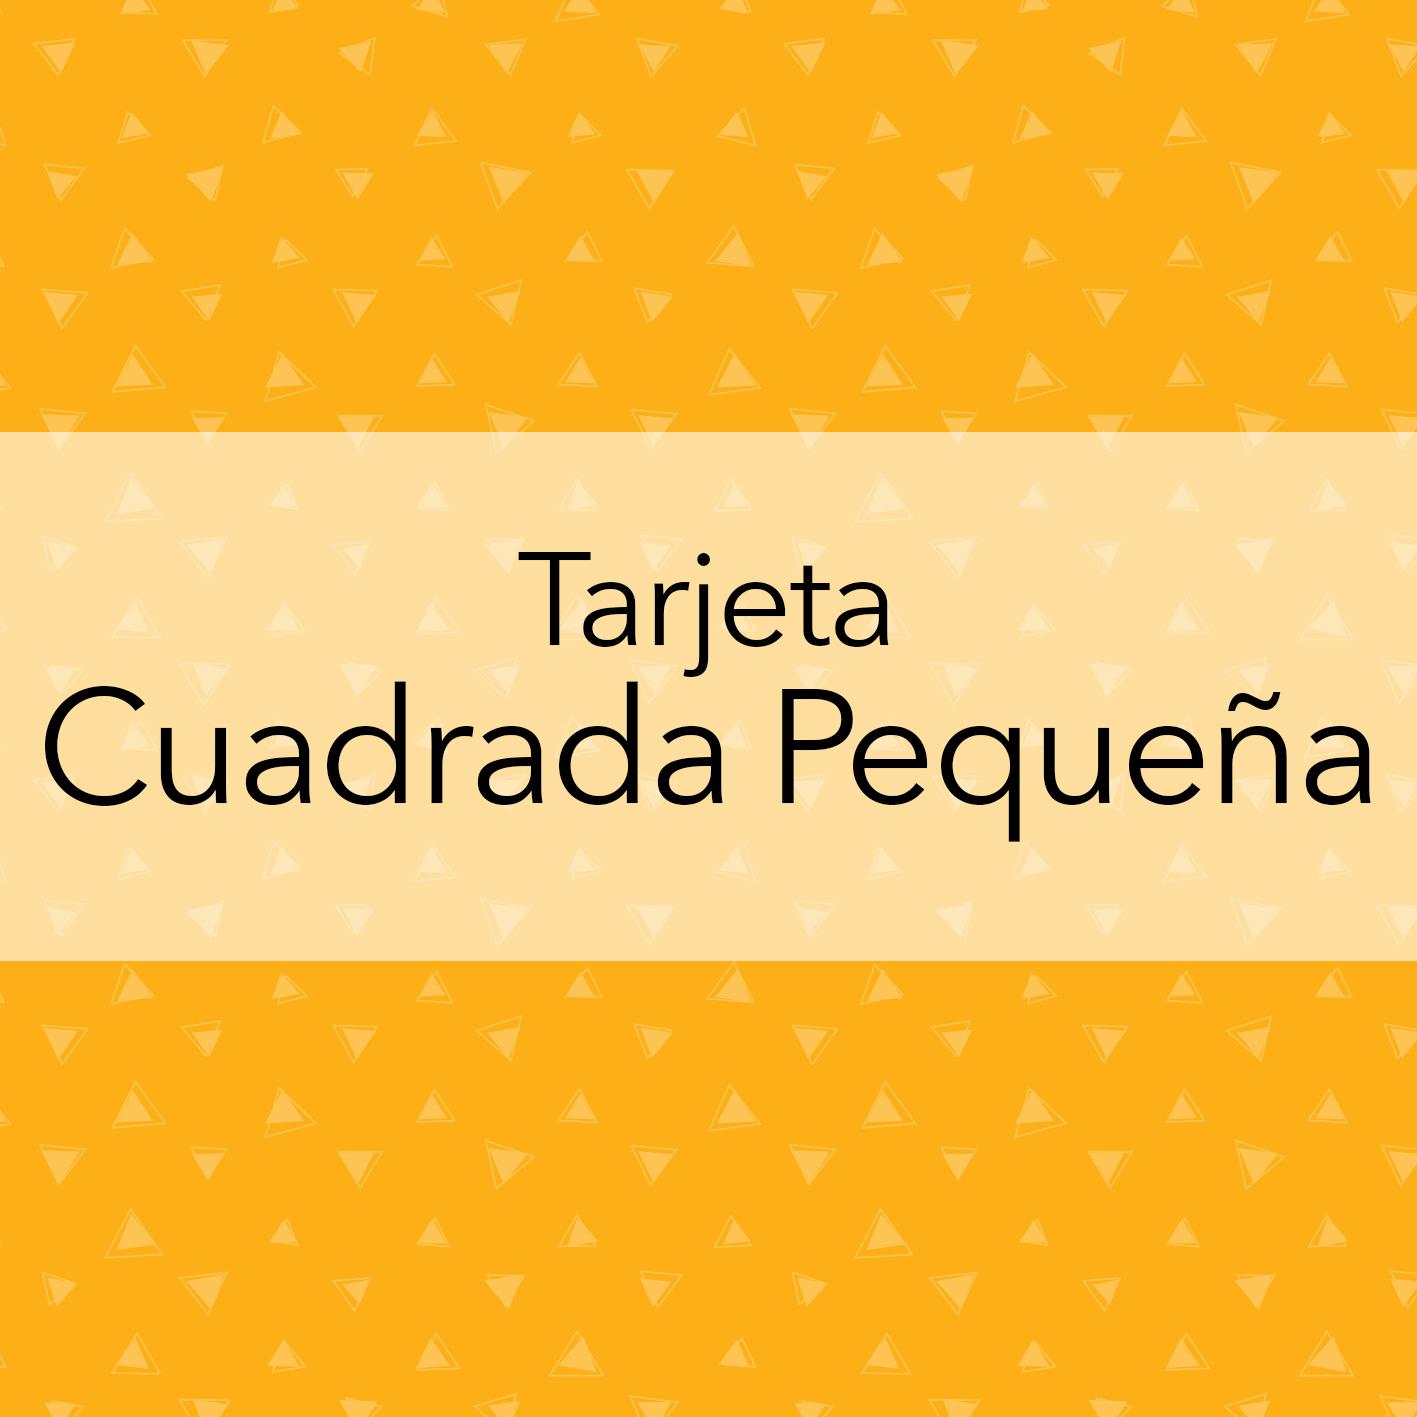 TARJETA CUADRADA PEQUEÑA